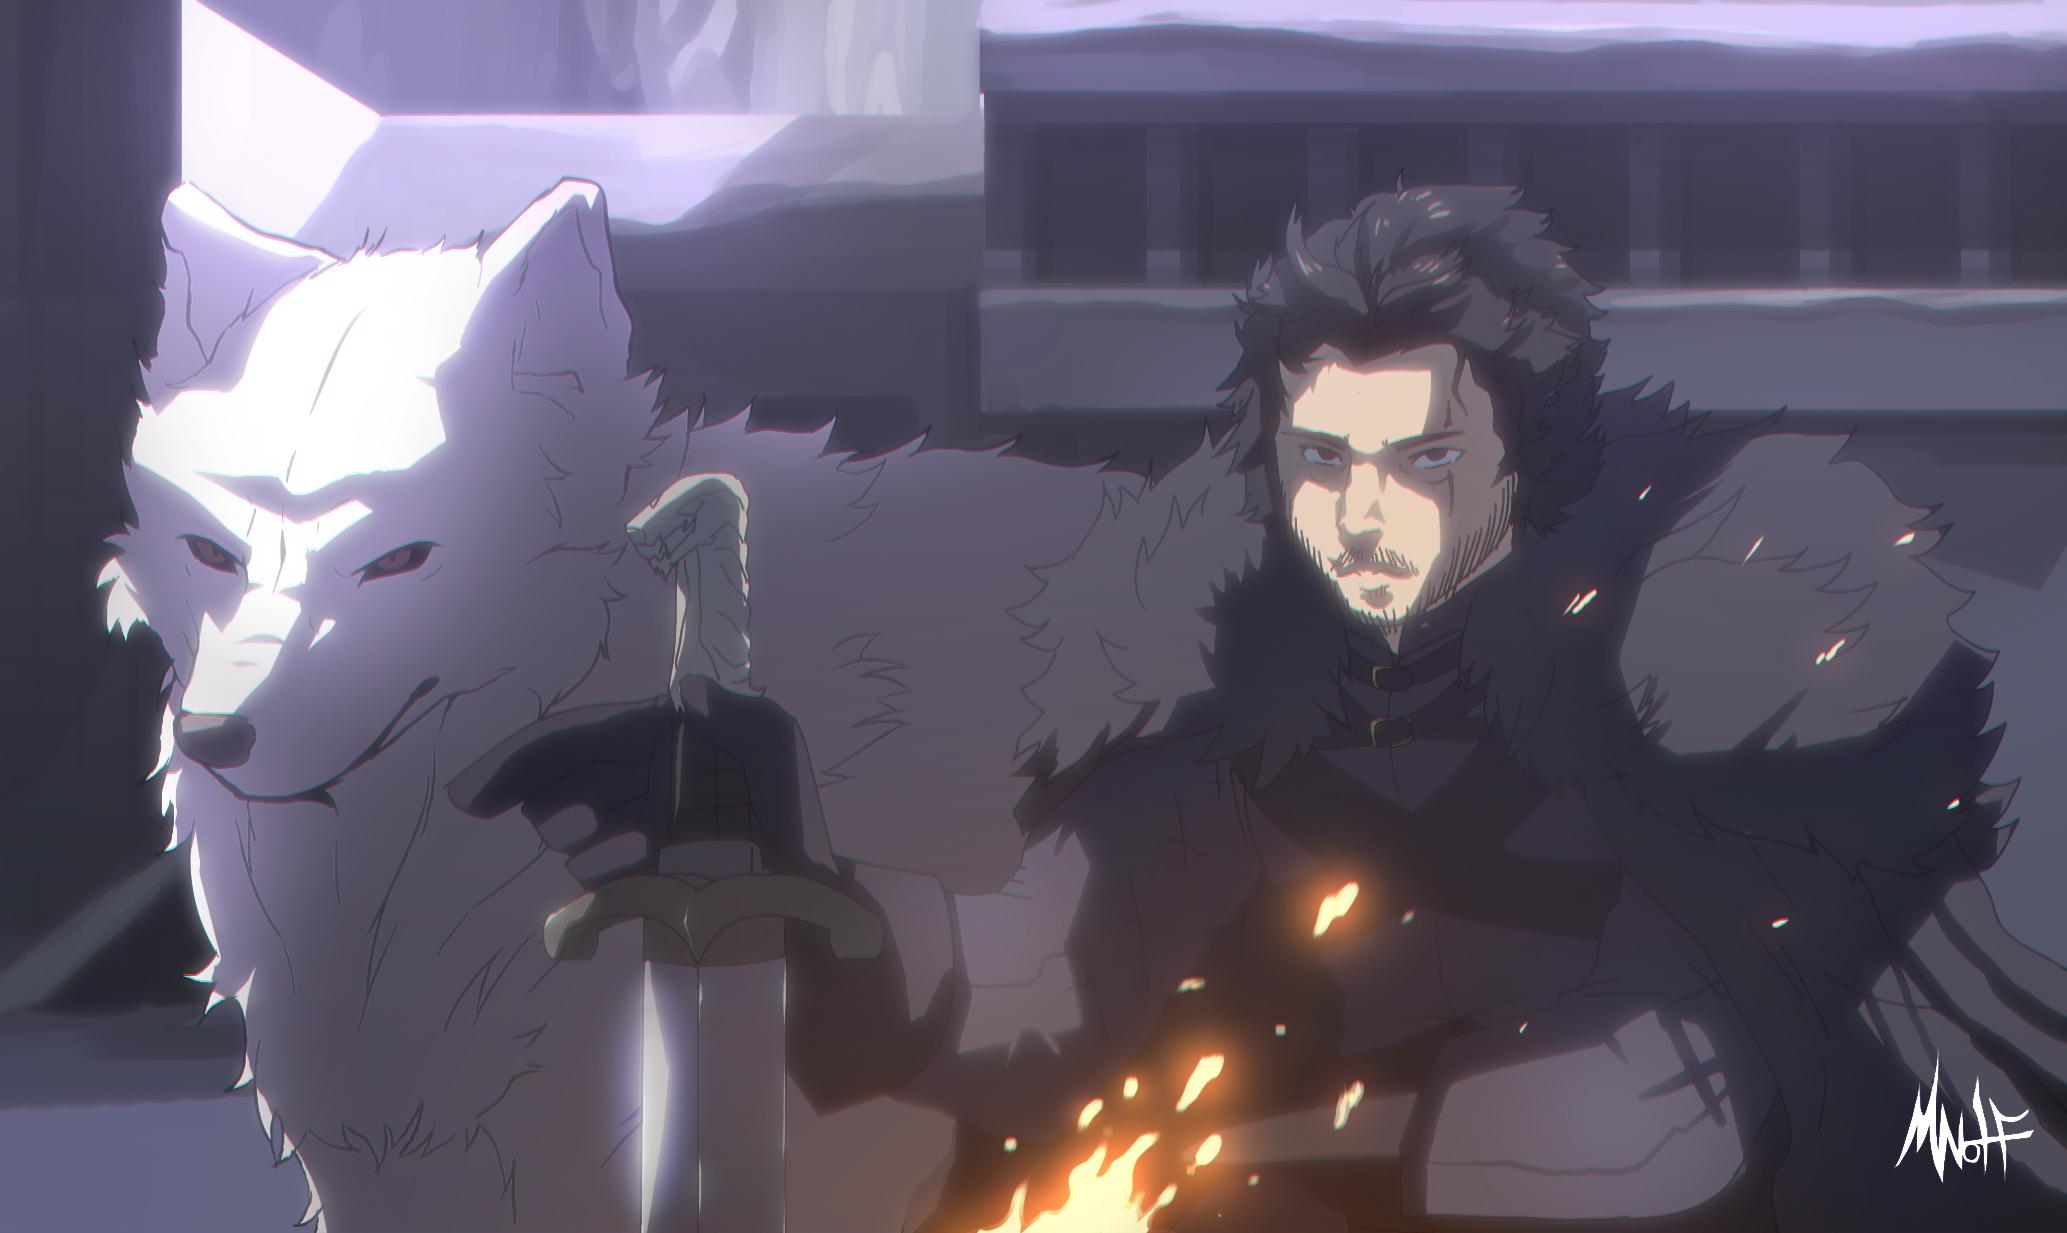 Jon Snow And Ghost By Mizu Wolf On Newgrounds